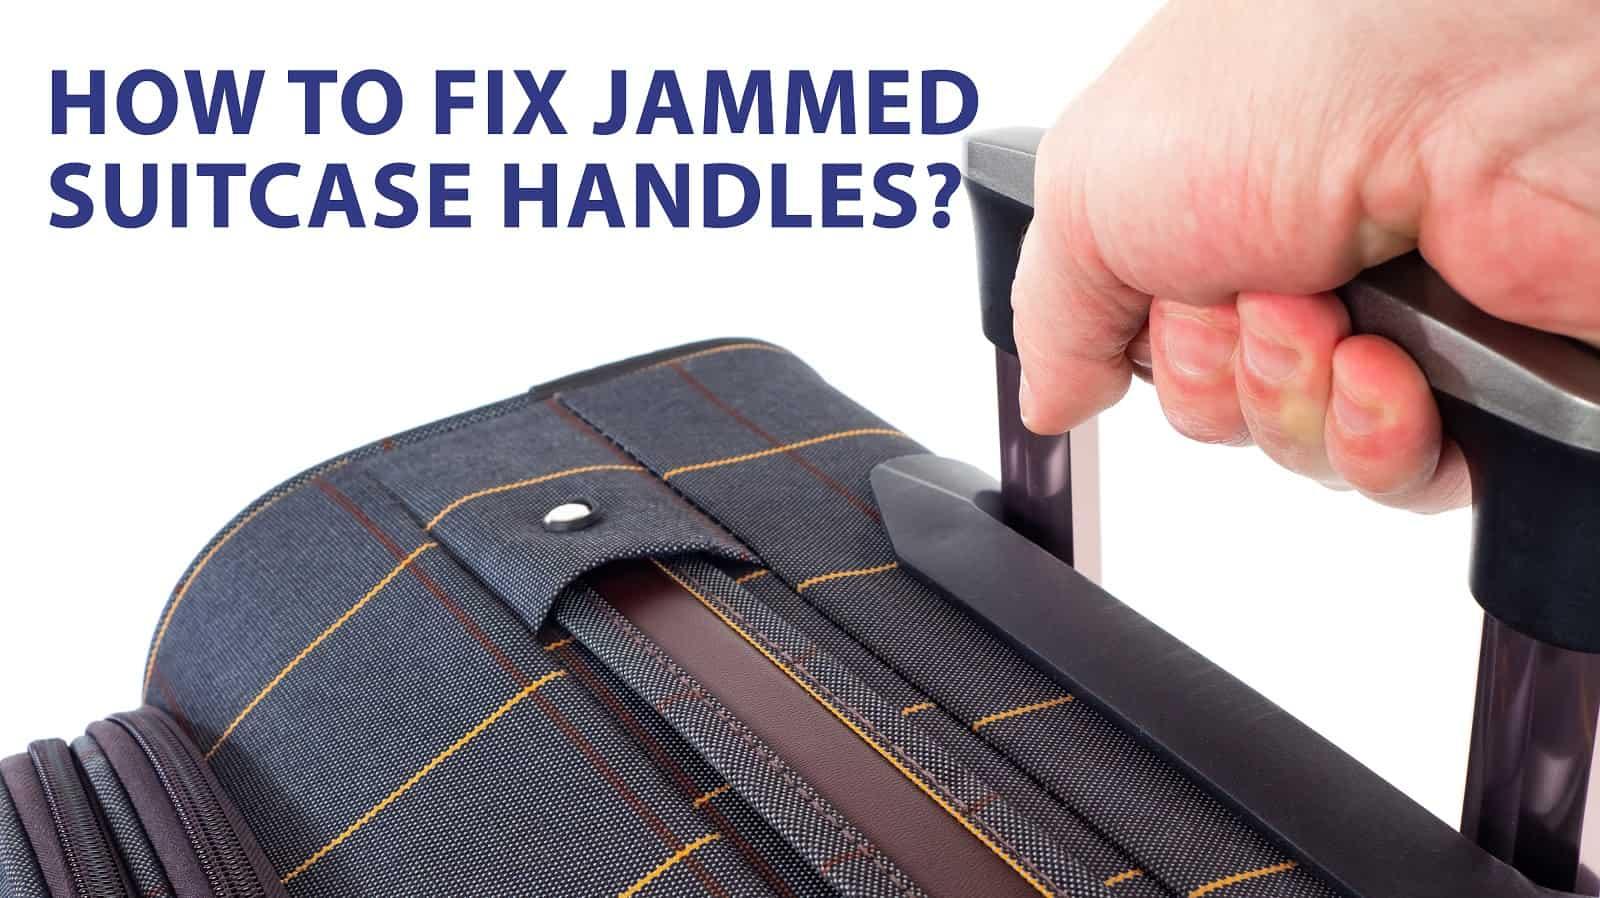 jammed luggage handles